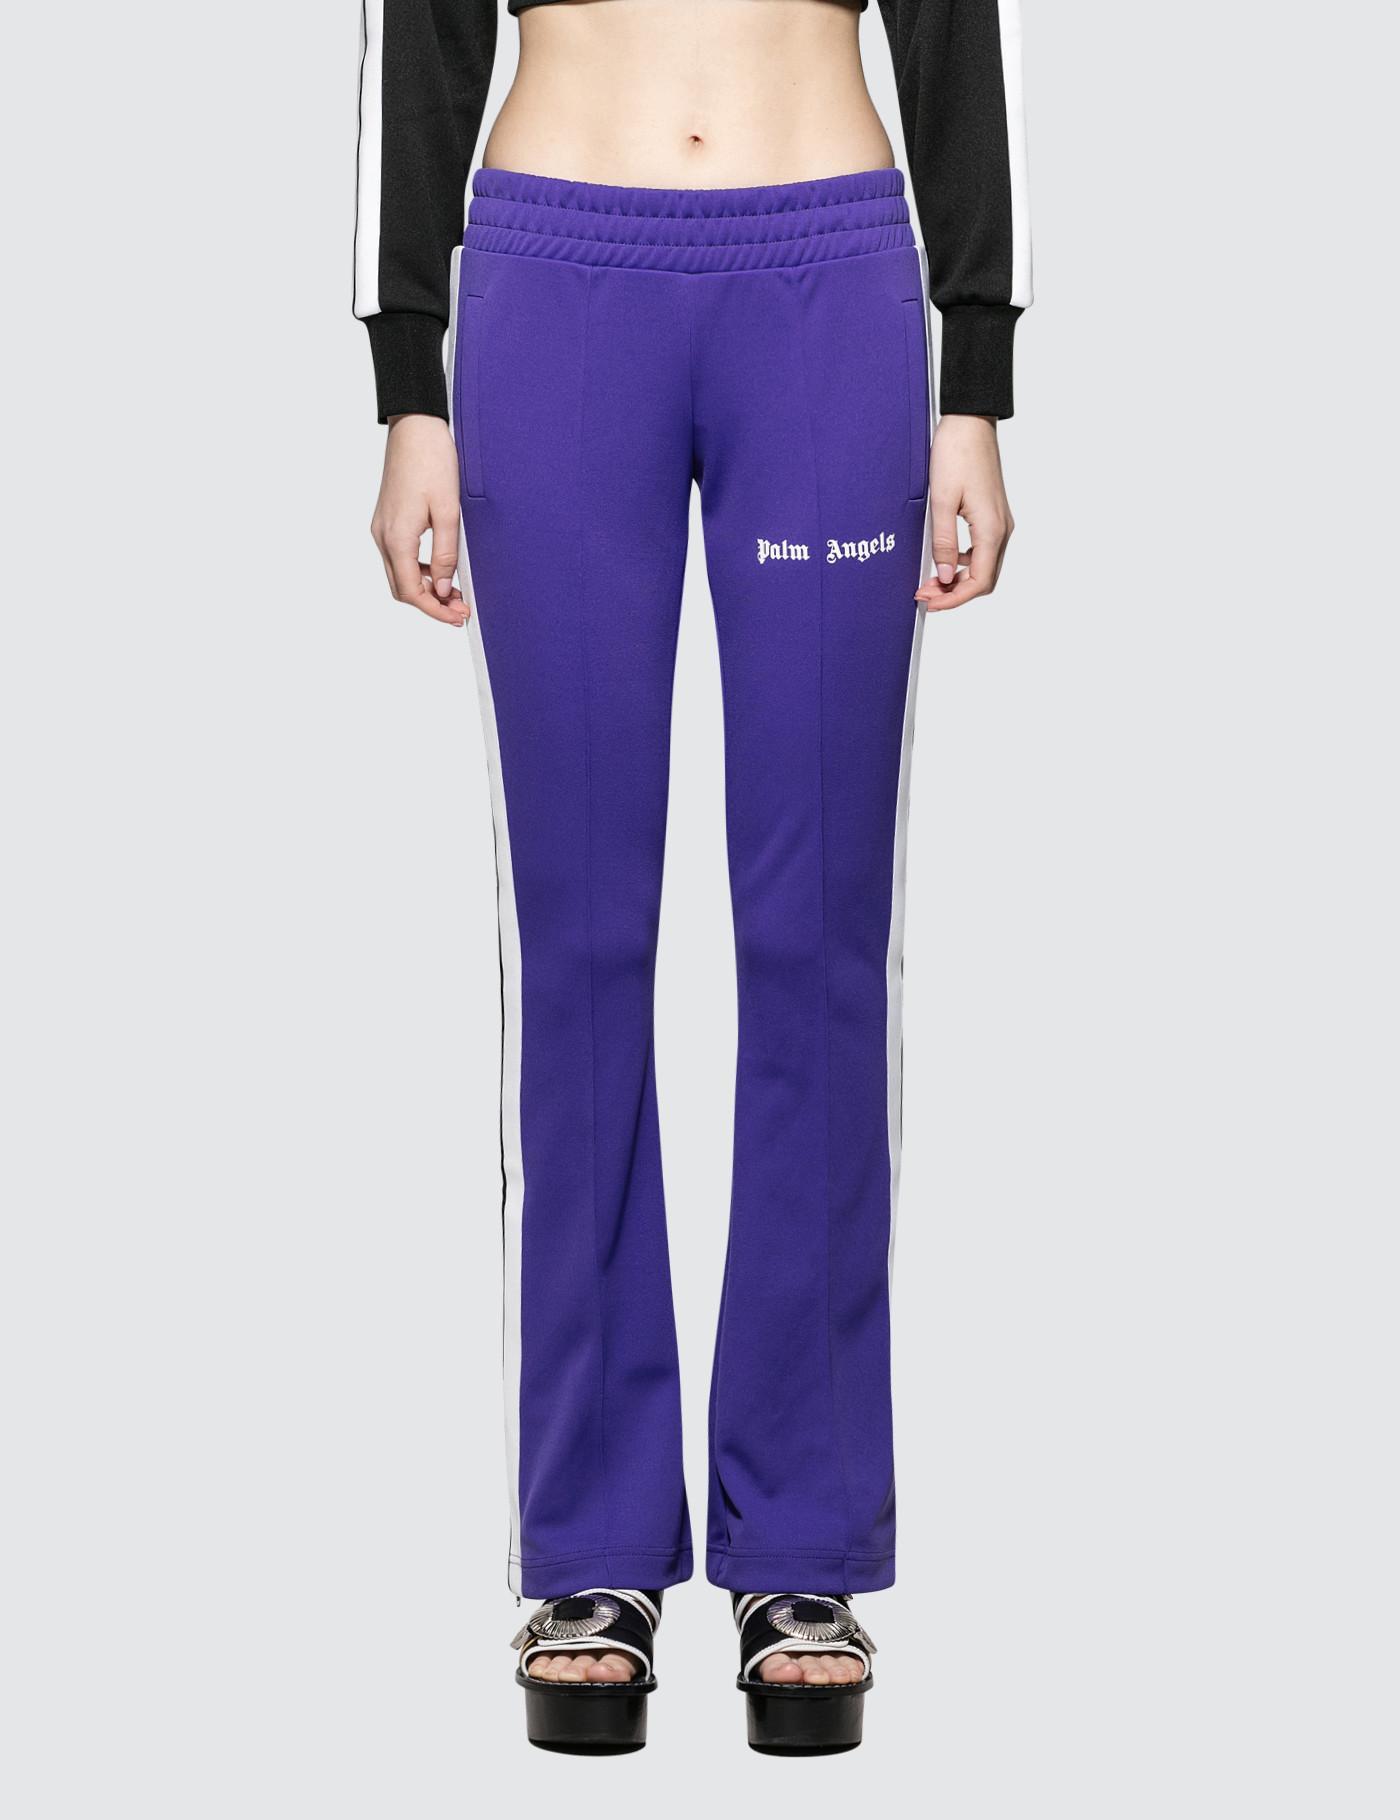 780f9296458ba1 Lyst - Palm Angels New Skinny Track Pants in Purple